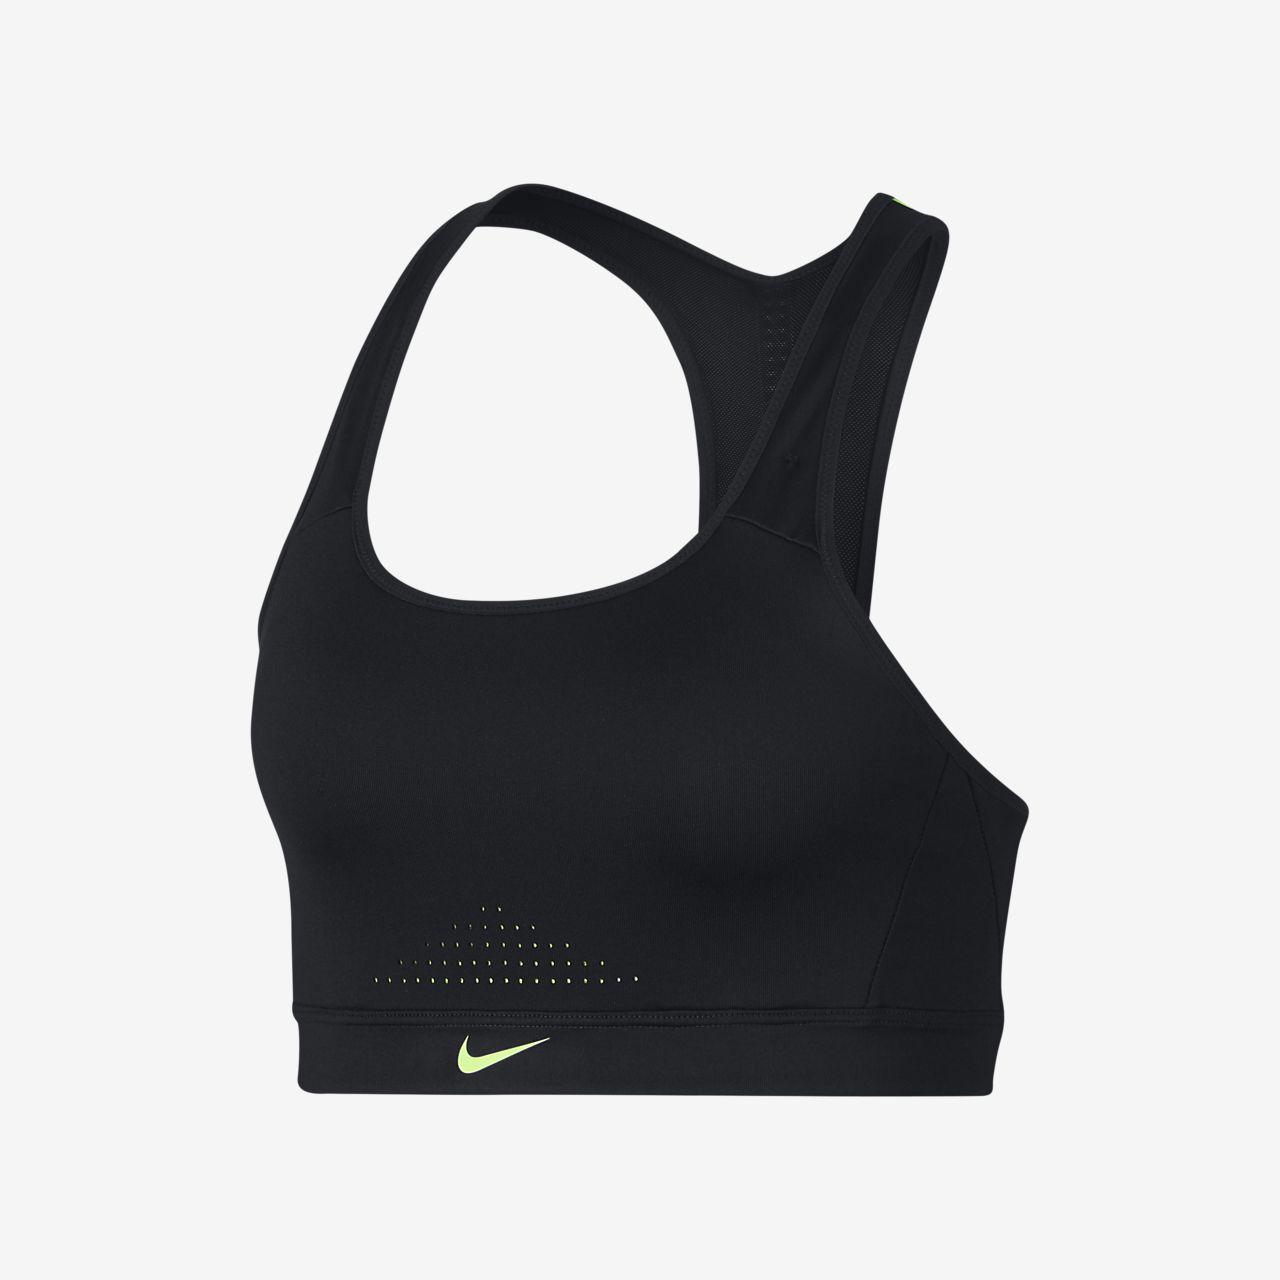 Nike Impact Women's High-Support Sports Bra